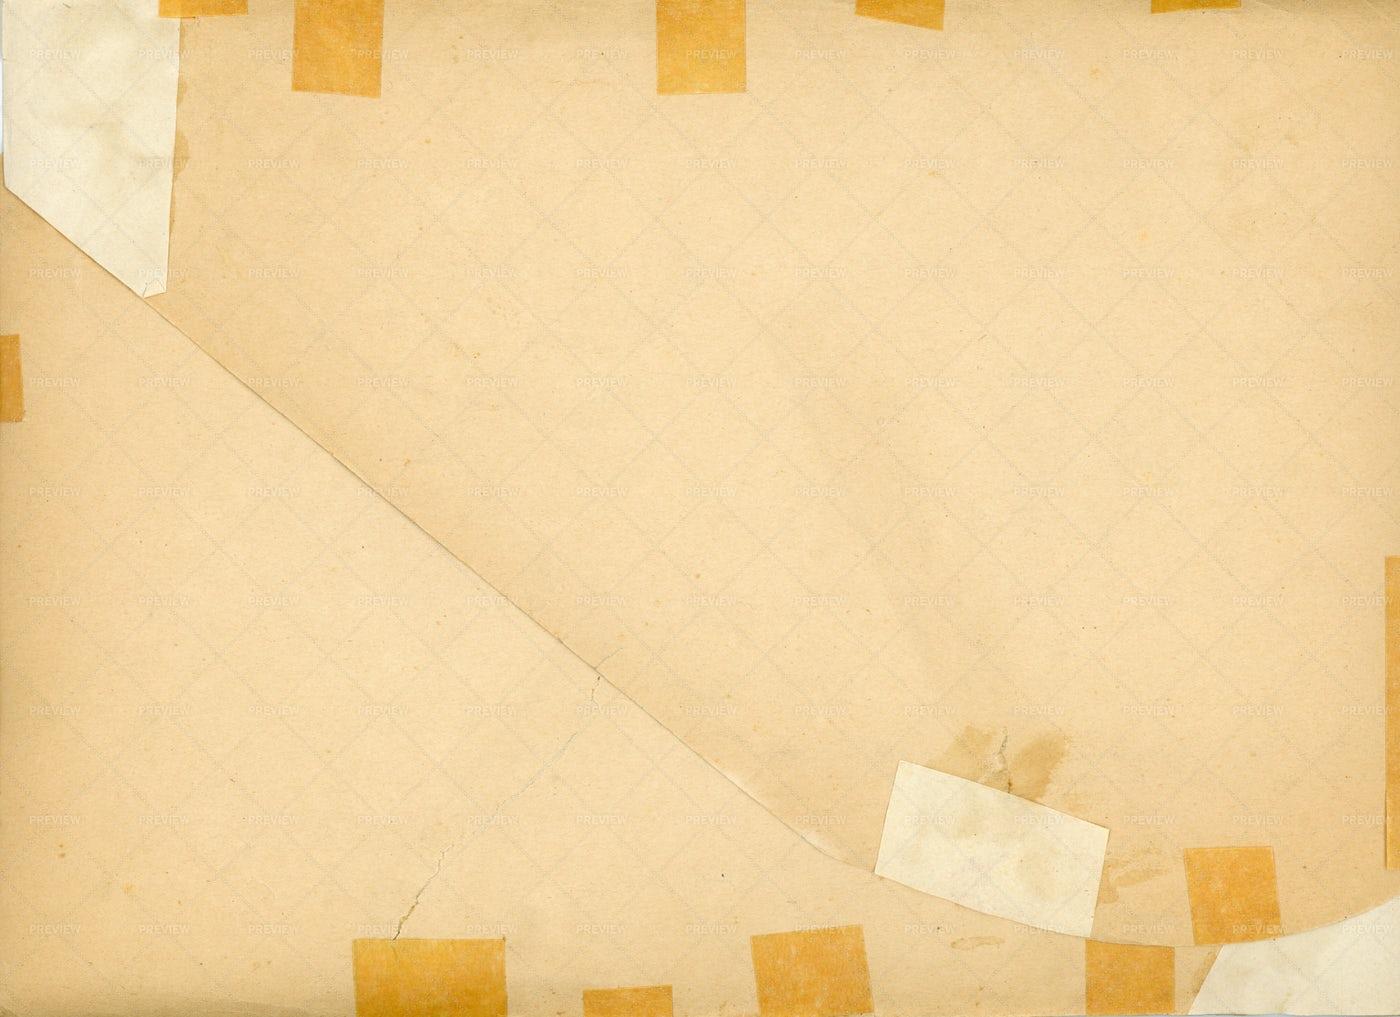 Grunge Paper Background: Stock Photos